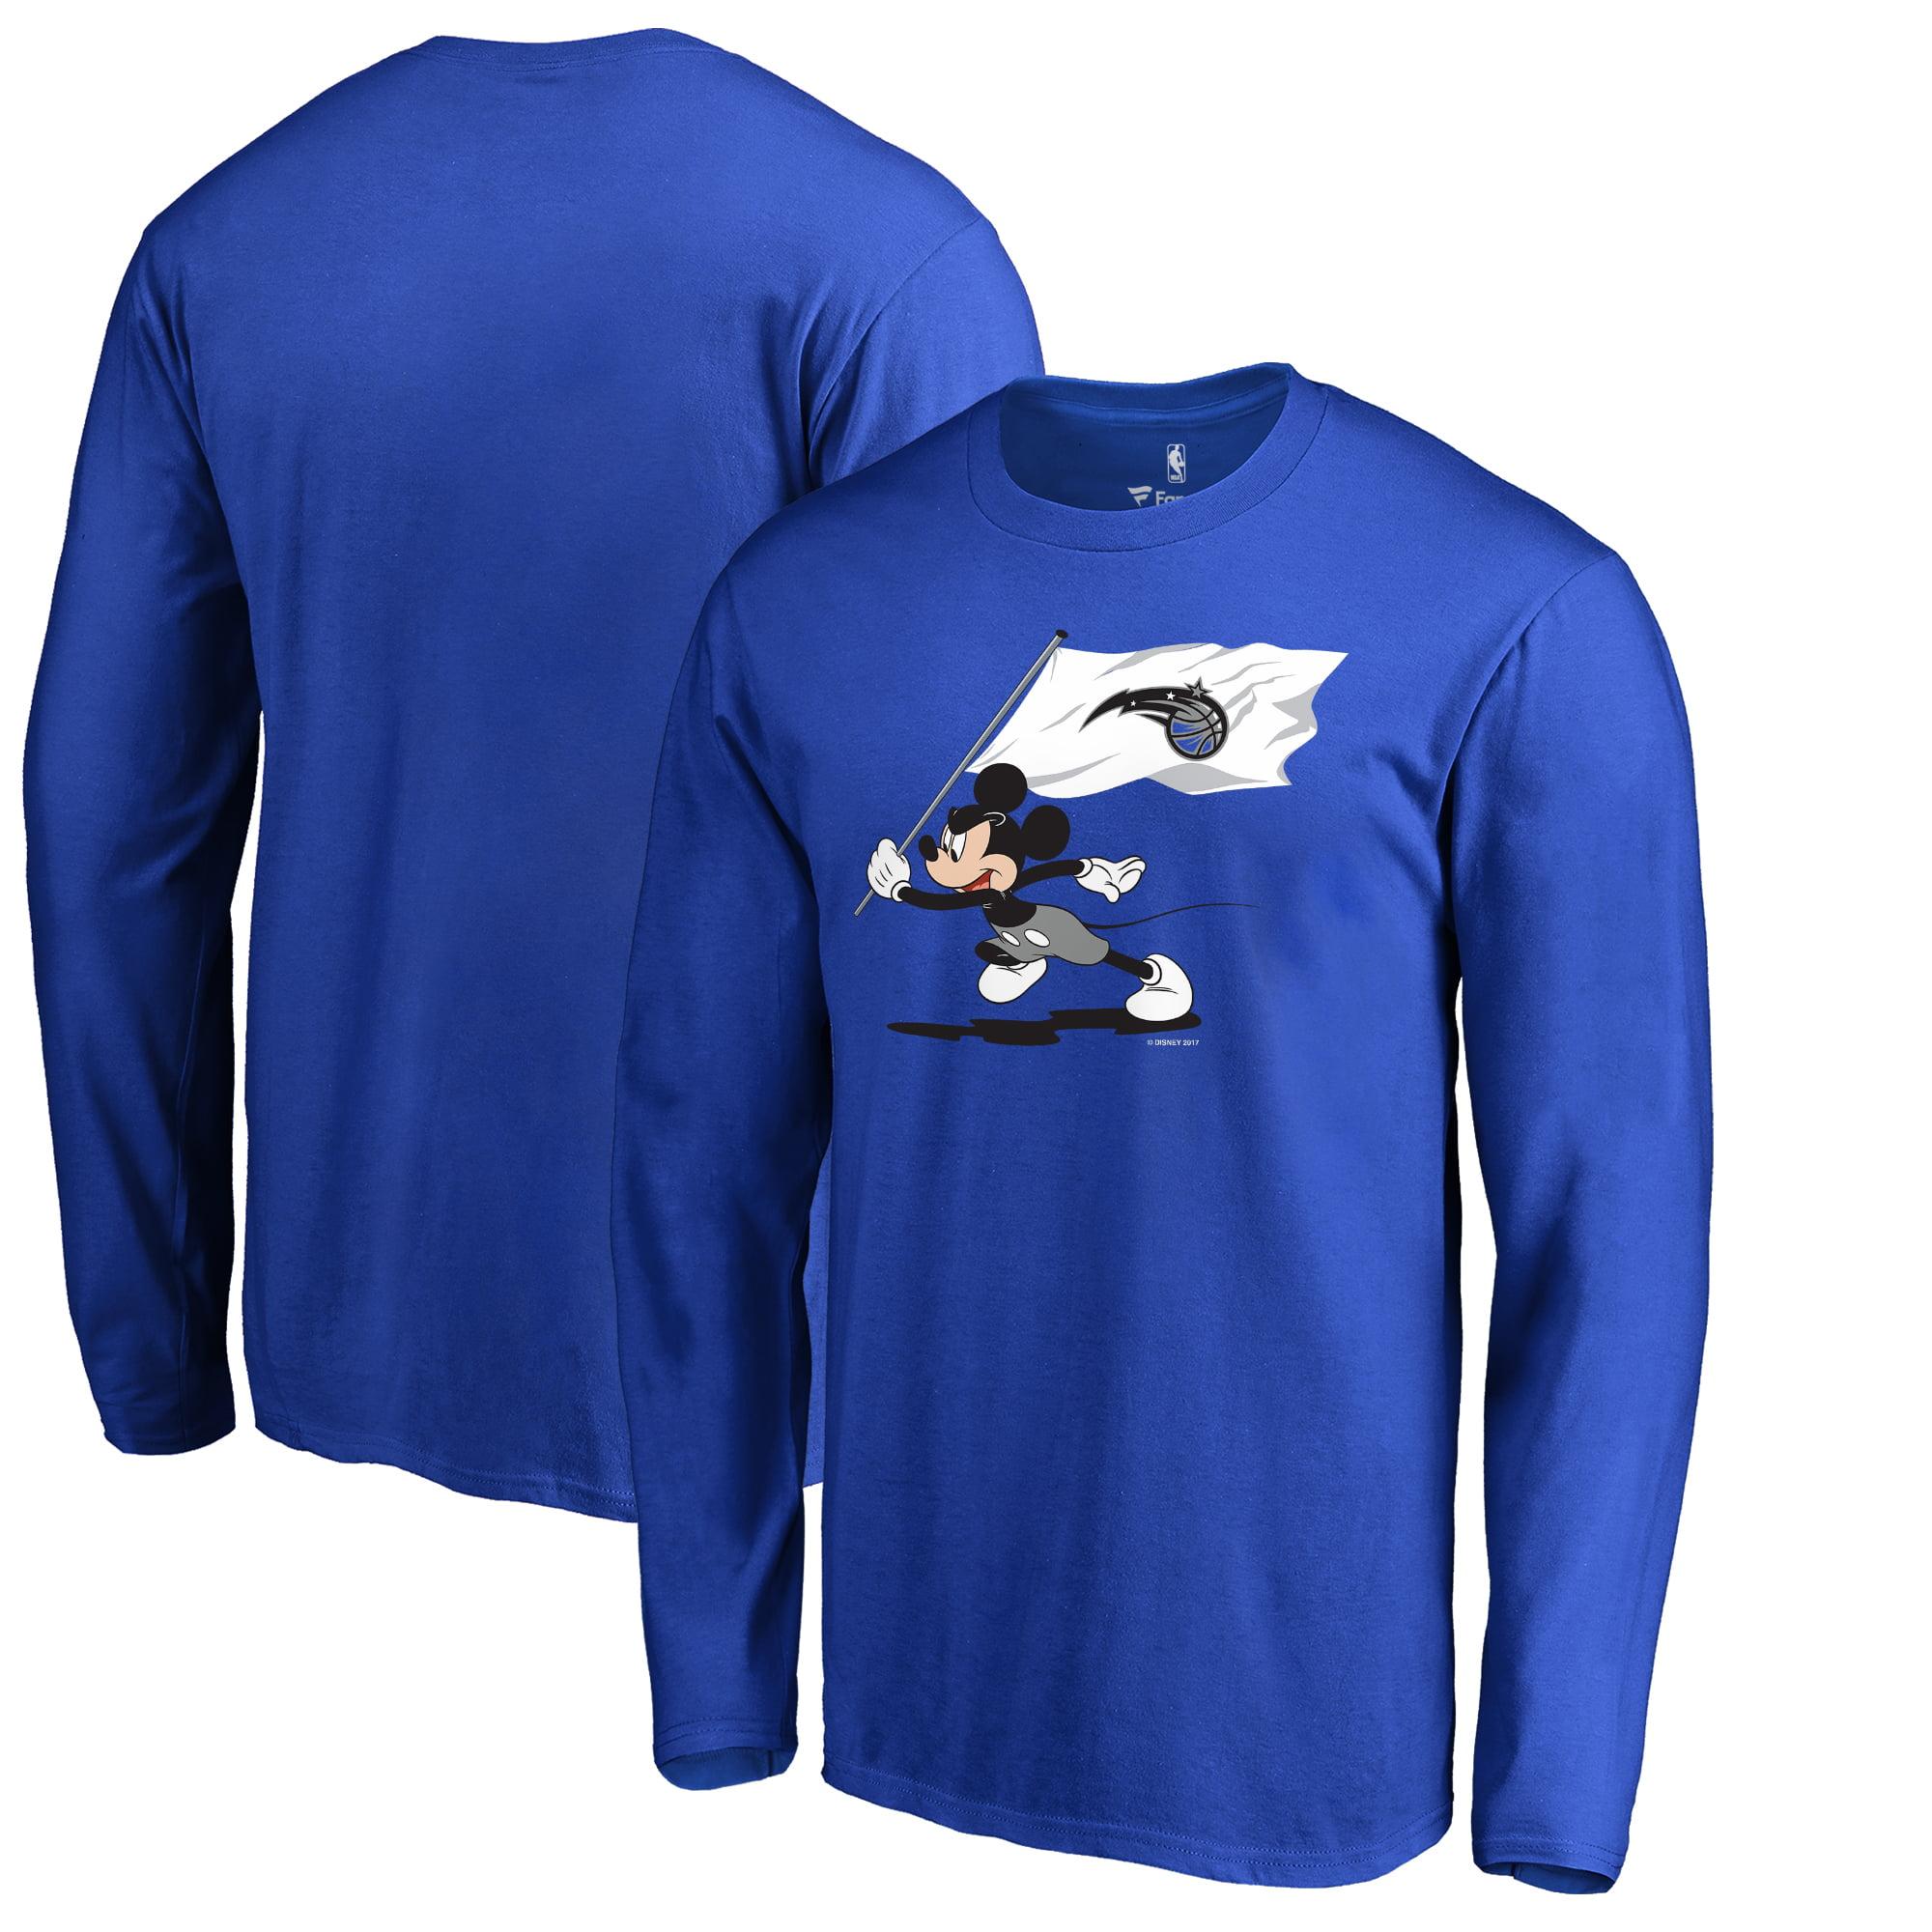 Orlando Magic Fanatics Branded Disney Fly Your Flag Long Sleeve T-Shirt - Blue